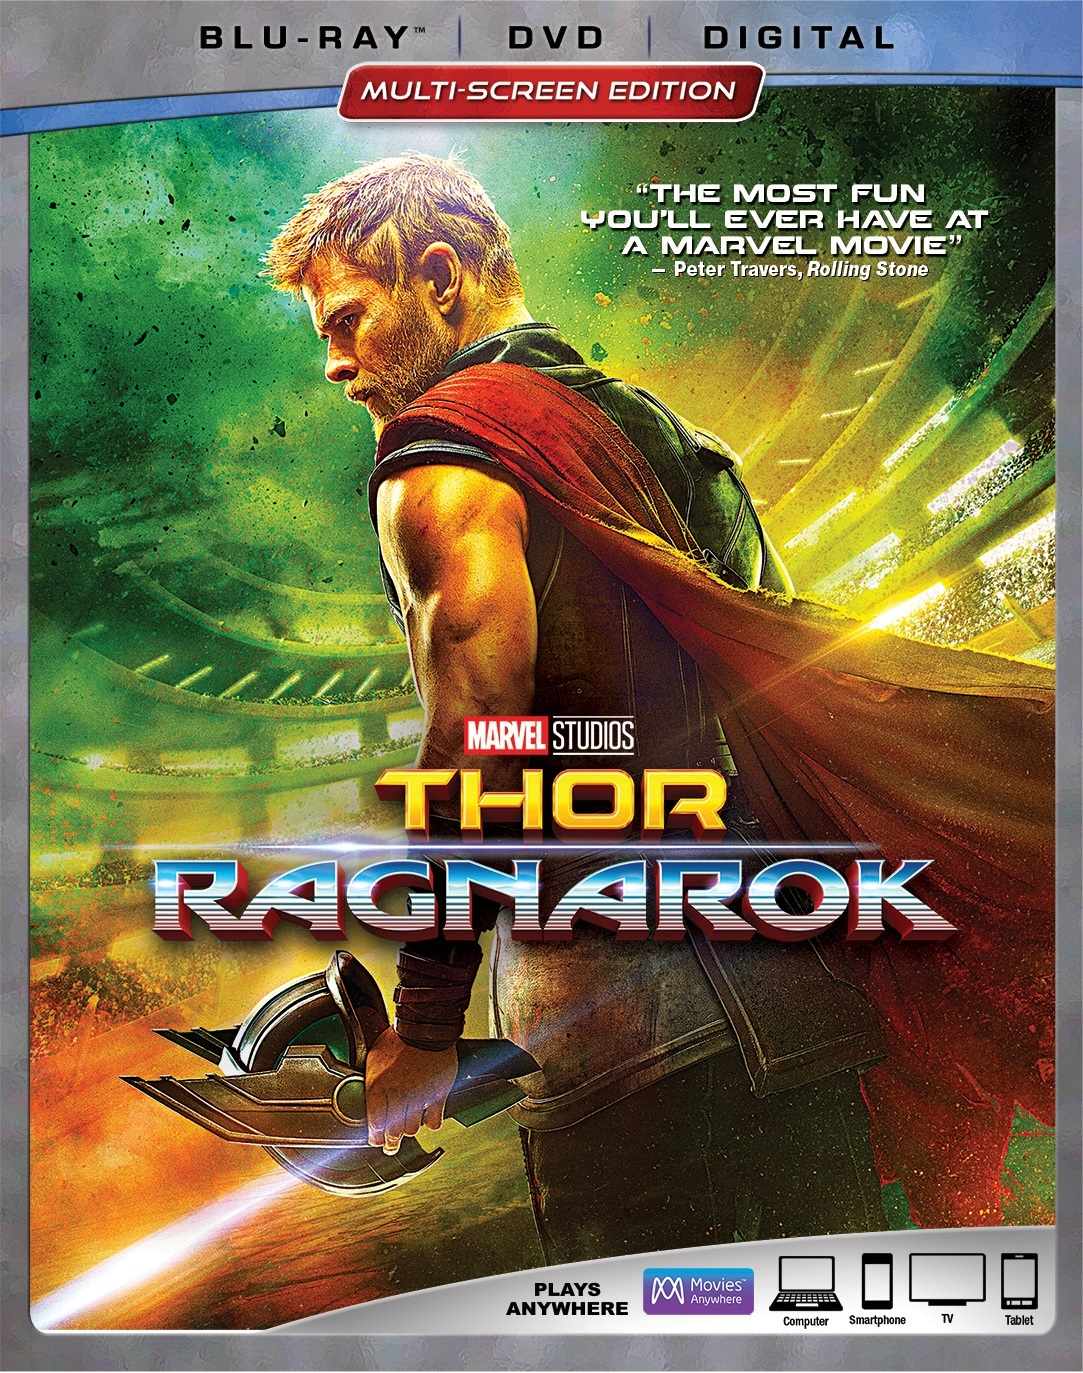 Thor: Ragnarok (2017) poster image